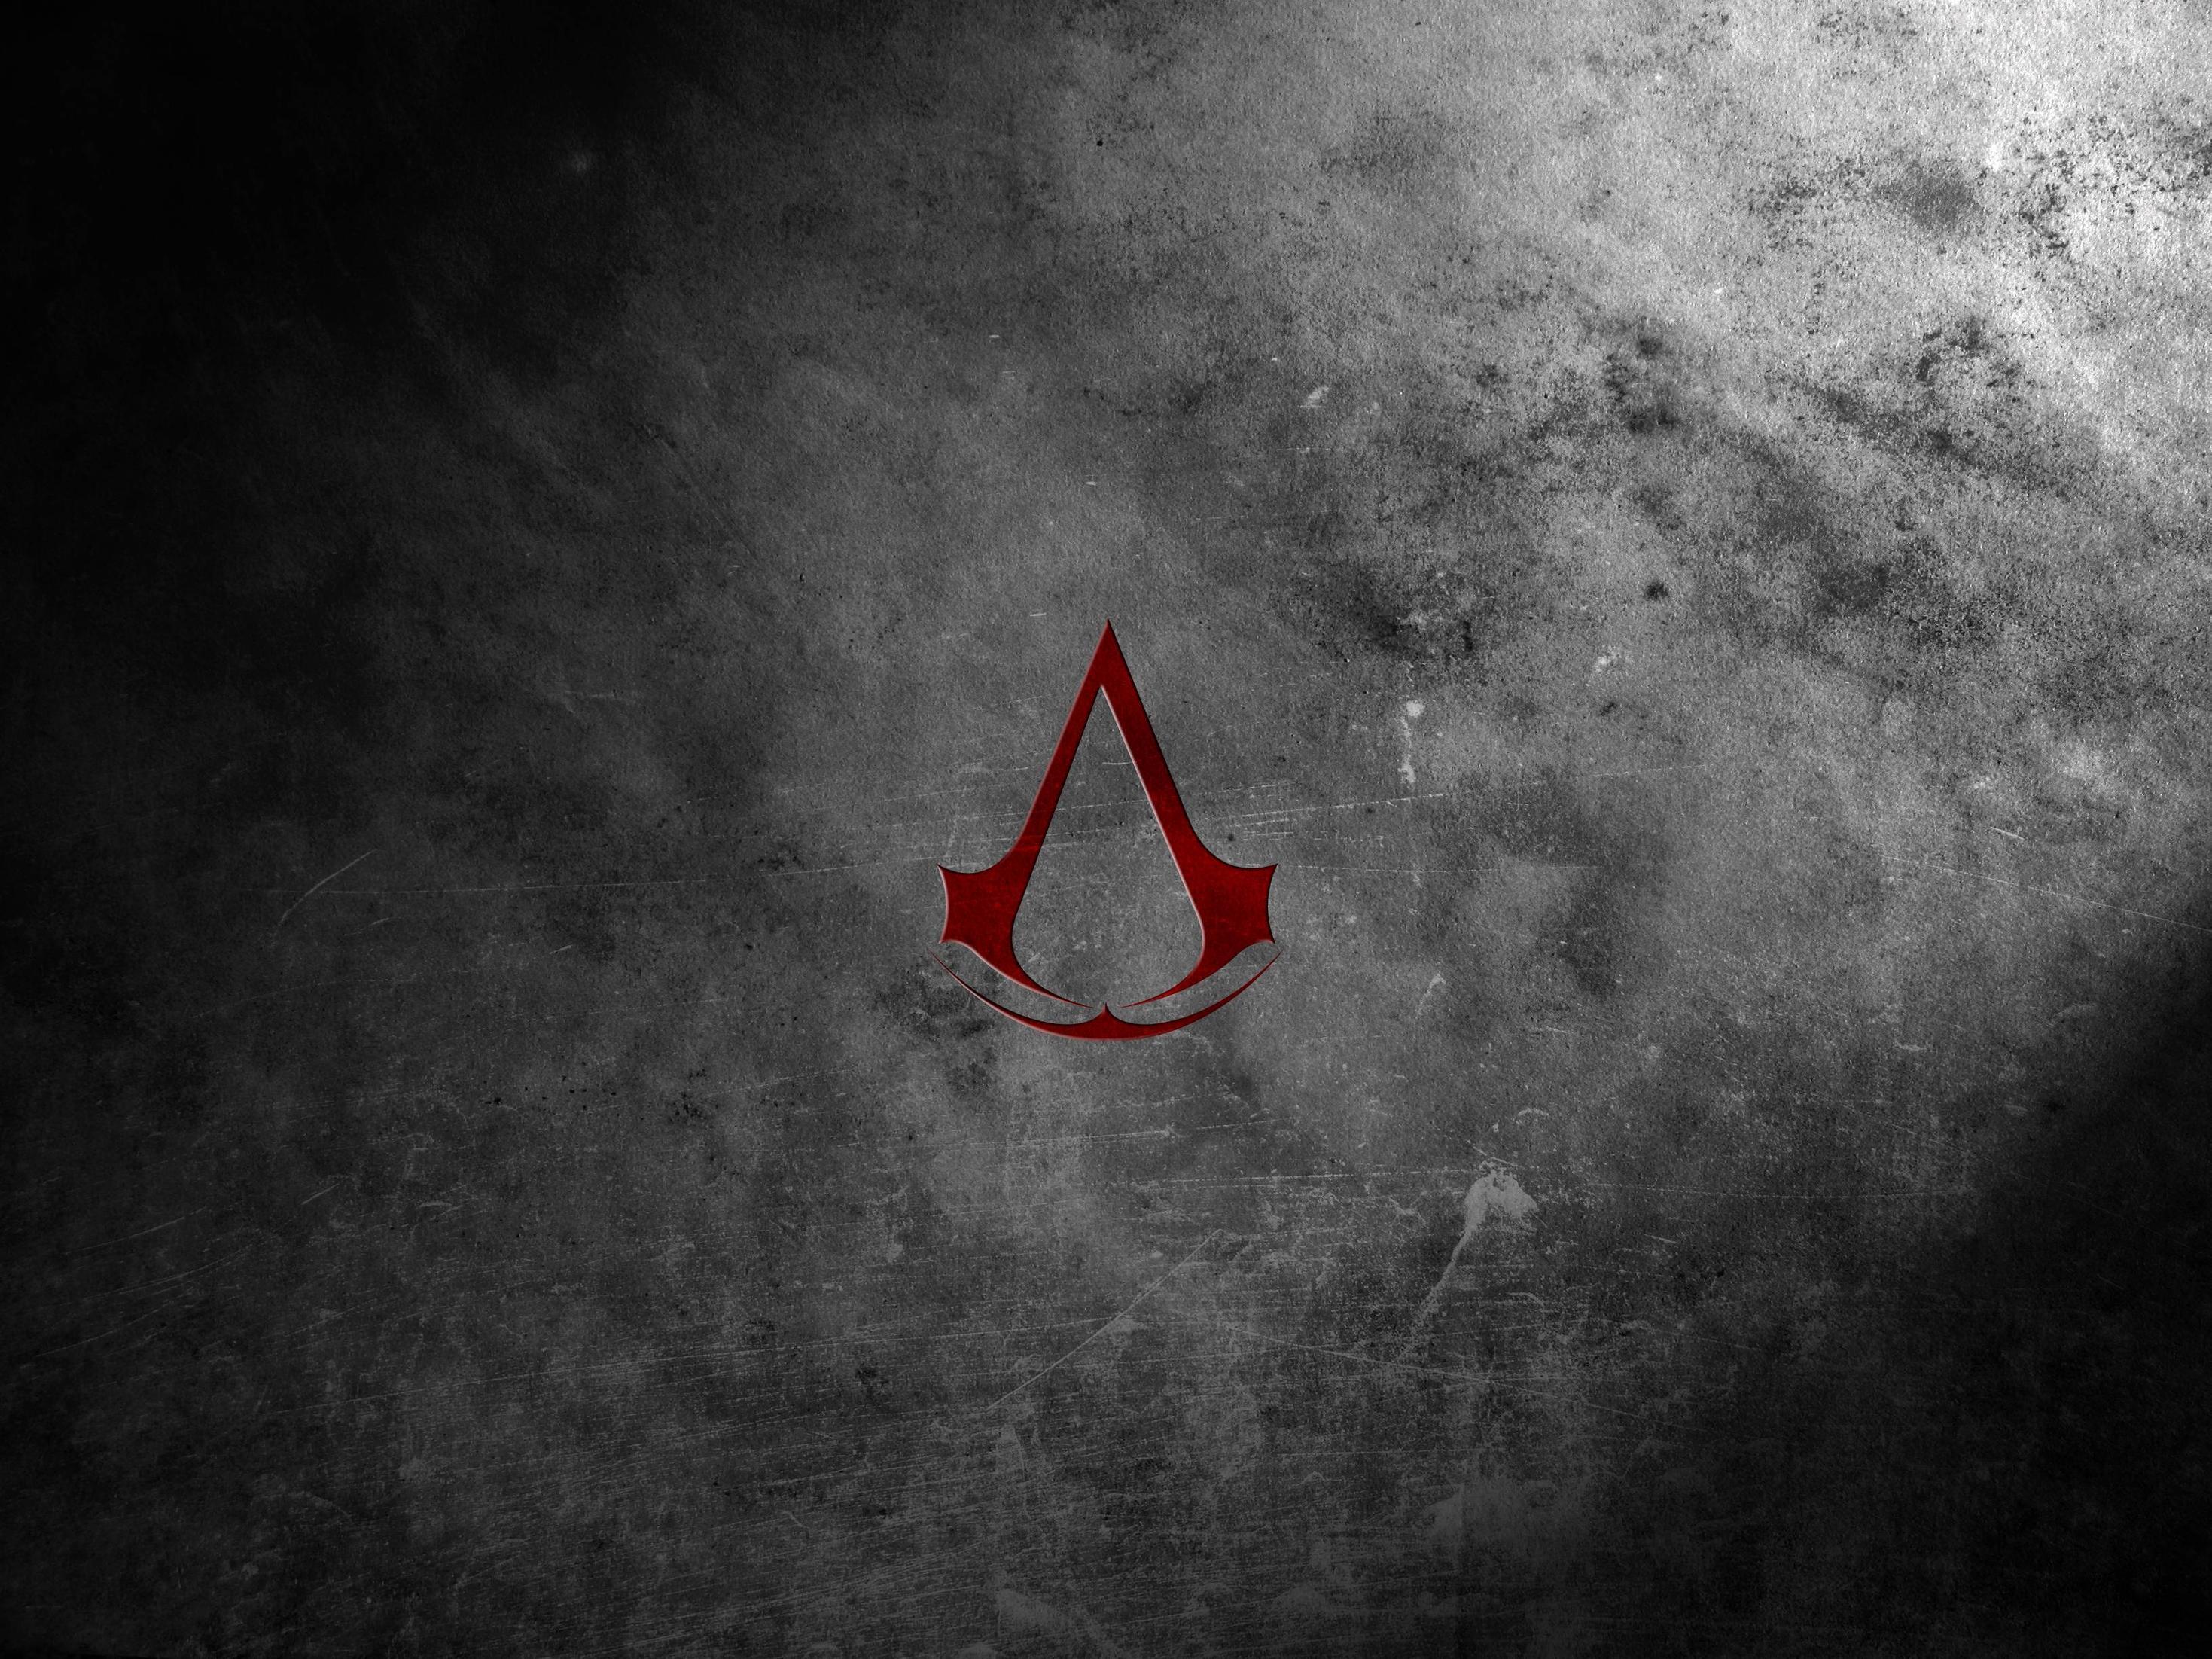 desktop assassins creed symbol - photo #45